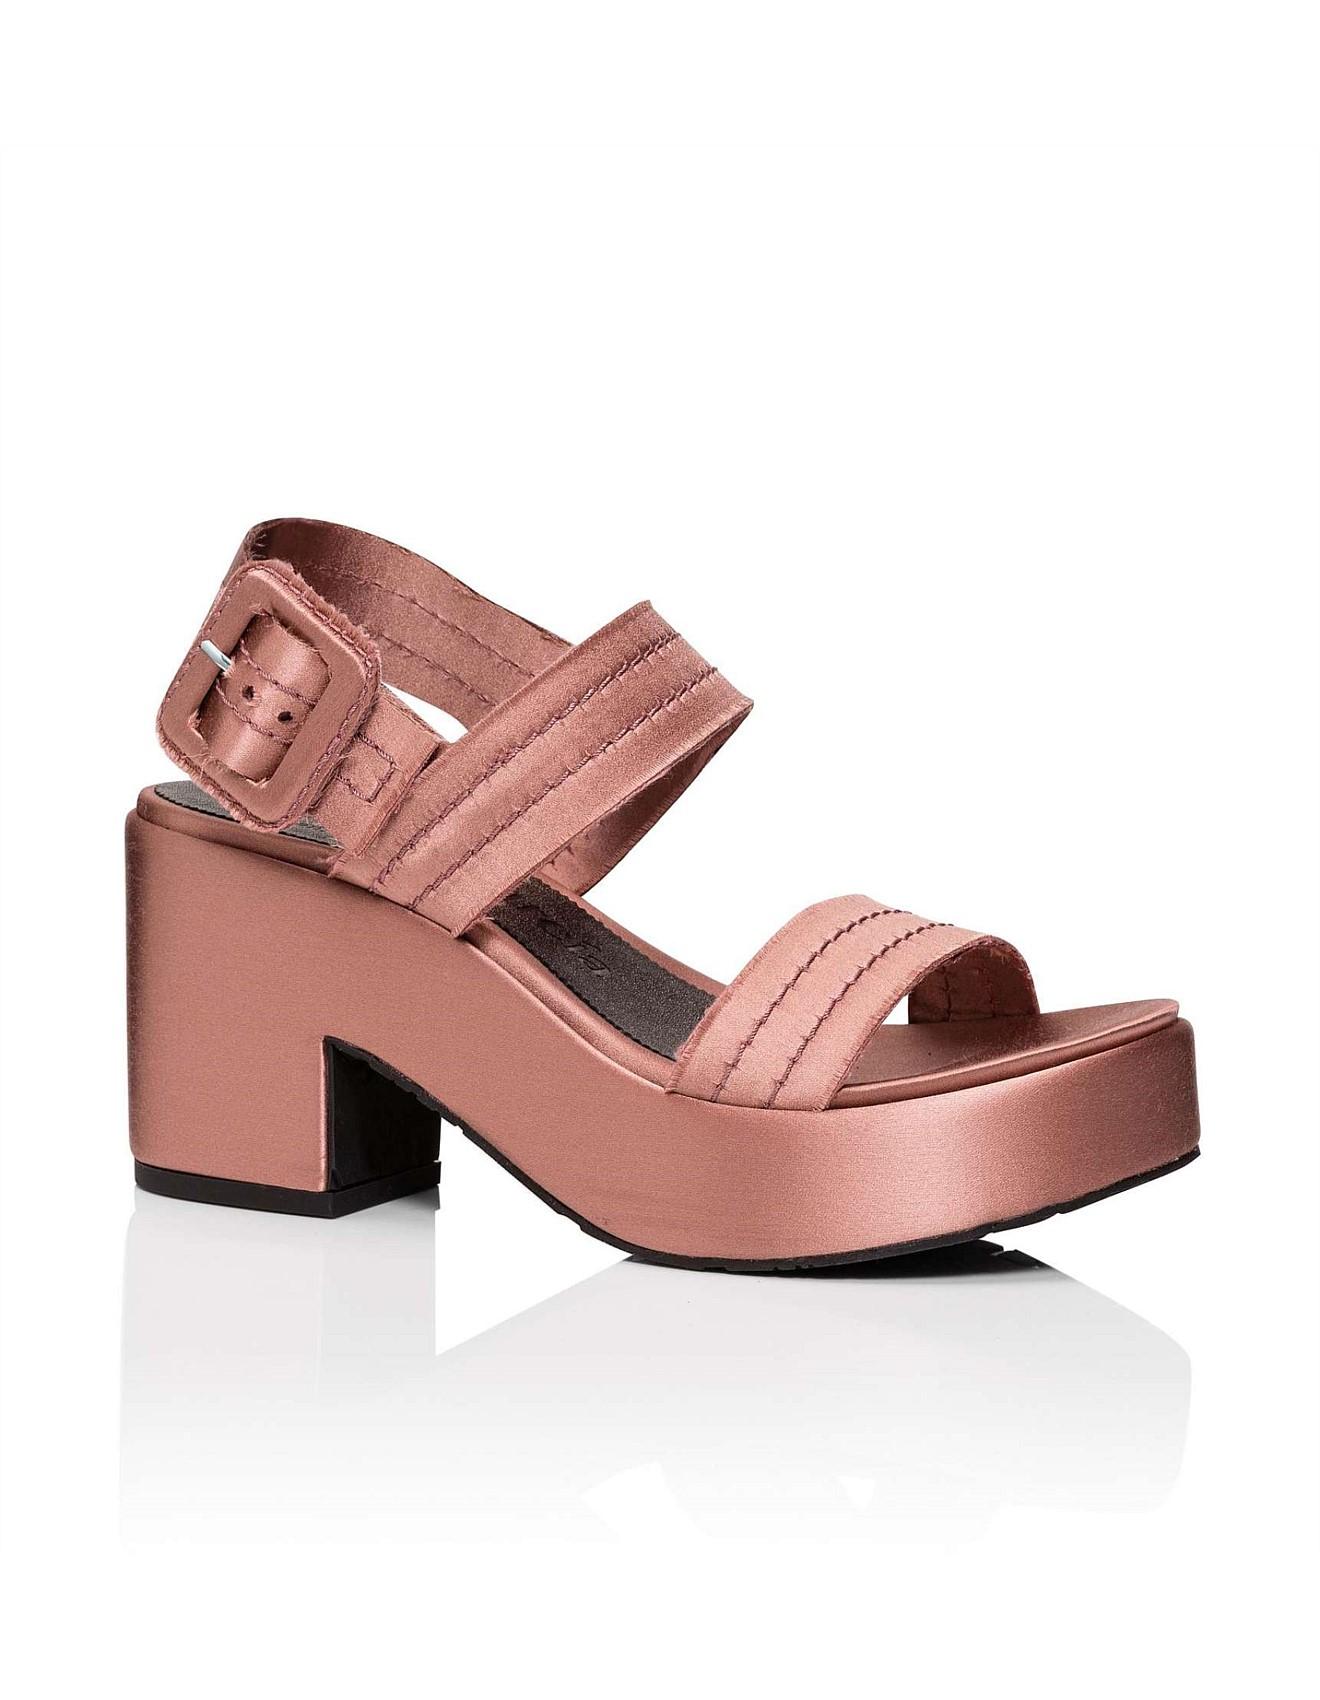 David Jones Ladies Sale Shoes